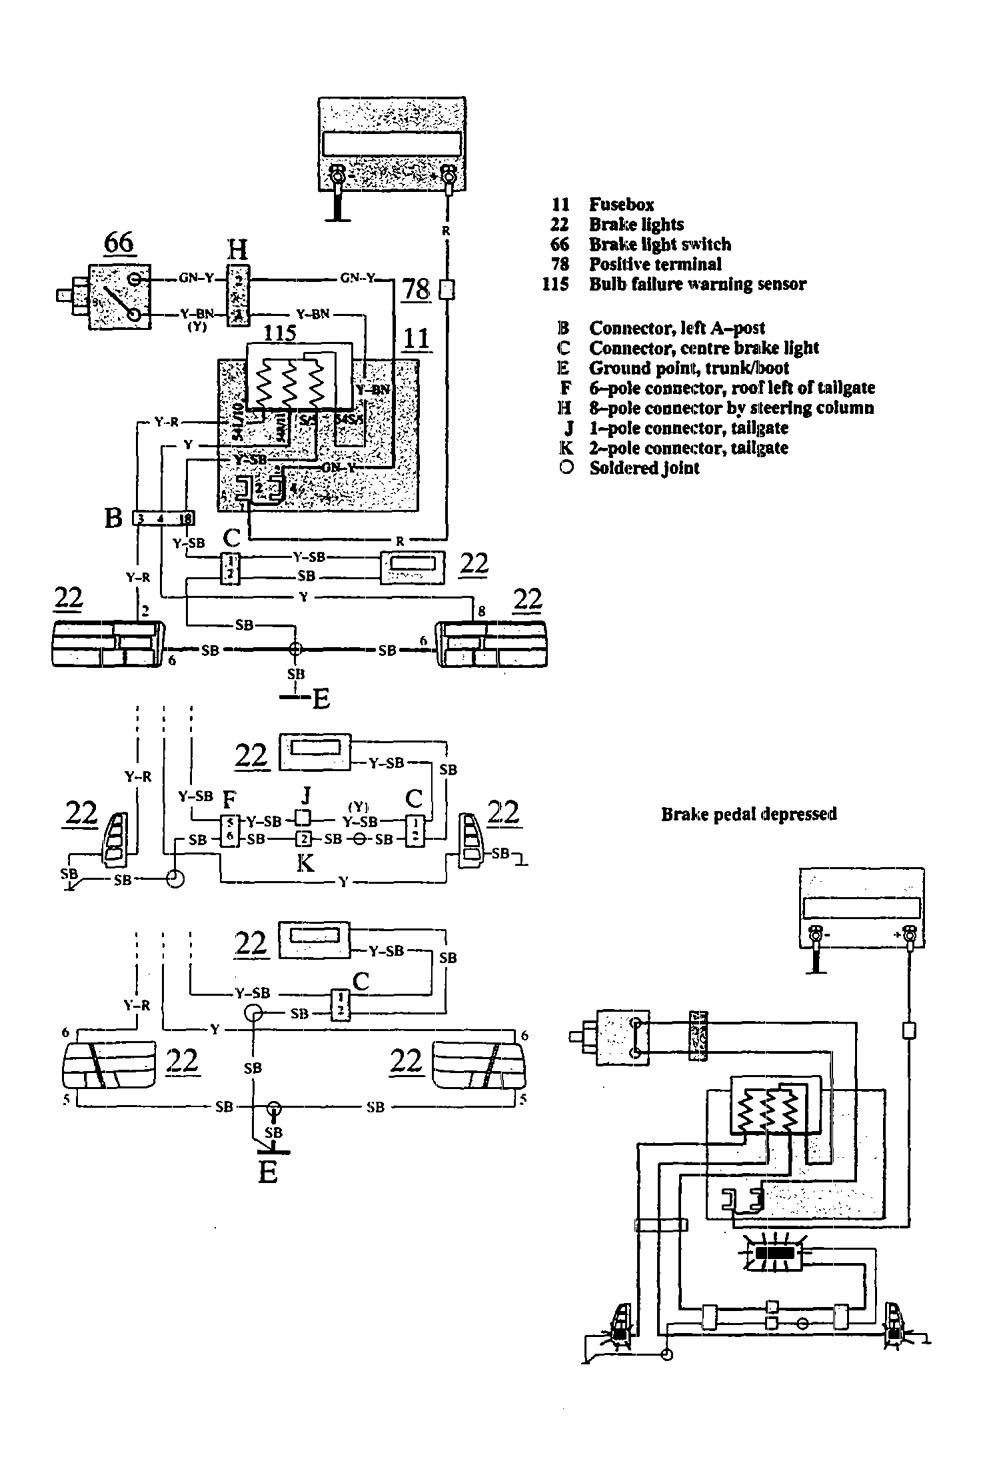 hight resolution of volvo 240 ke light wiring diagram u2022 wiring diagram for free volvo 240 tail light wiring diagram 1993 volvo 240 wiring diagram